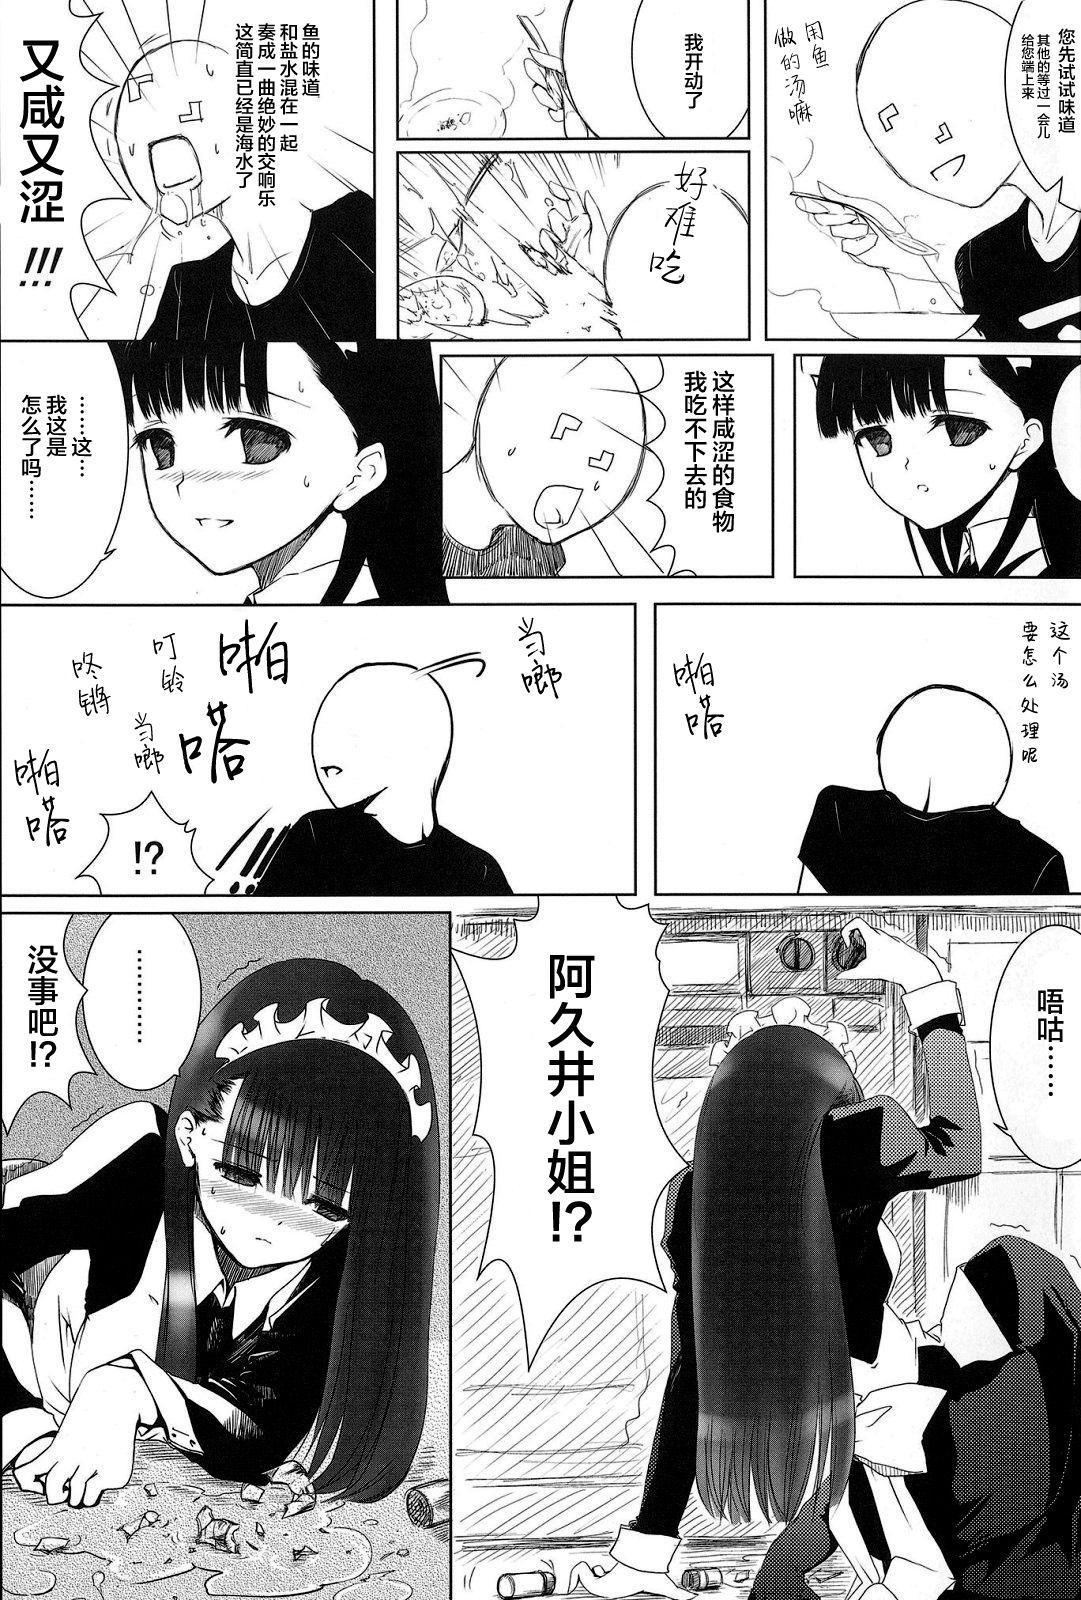 [Heikoushihenkei (Kawanakajima)] Akui-san ga Kaze hi-ta 1 [Chinese] [lolipoi汉化组] [2014-06-10] 6